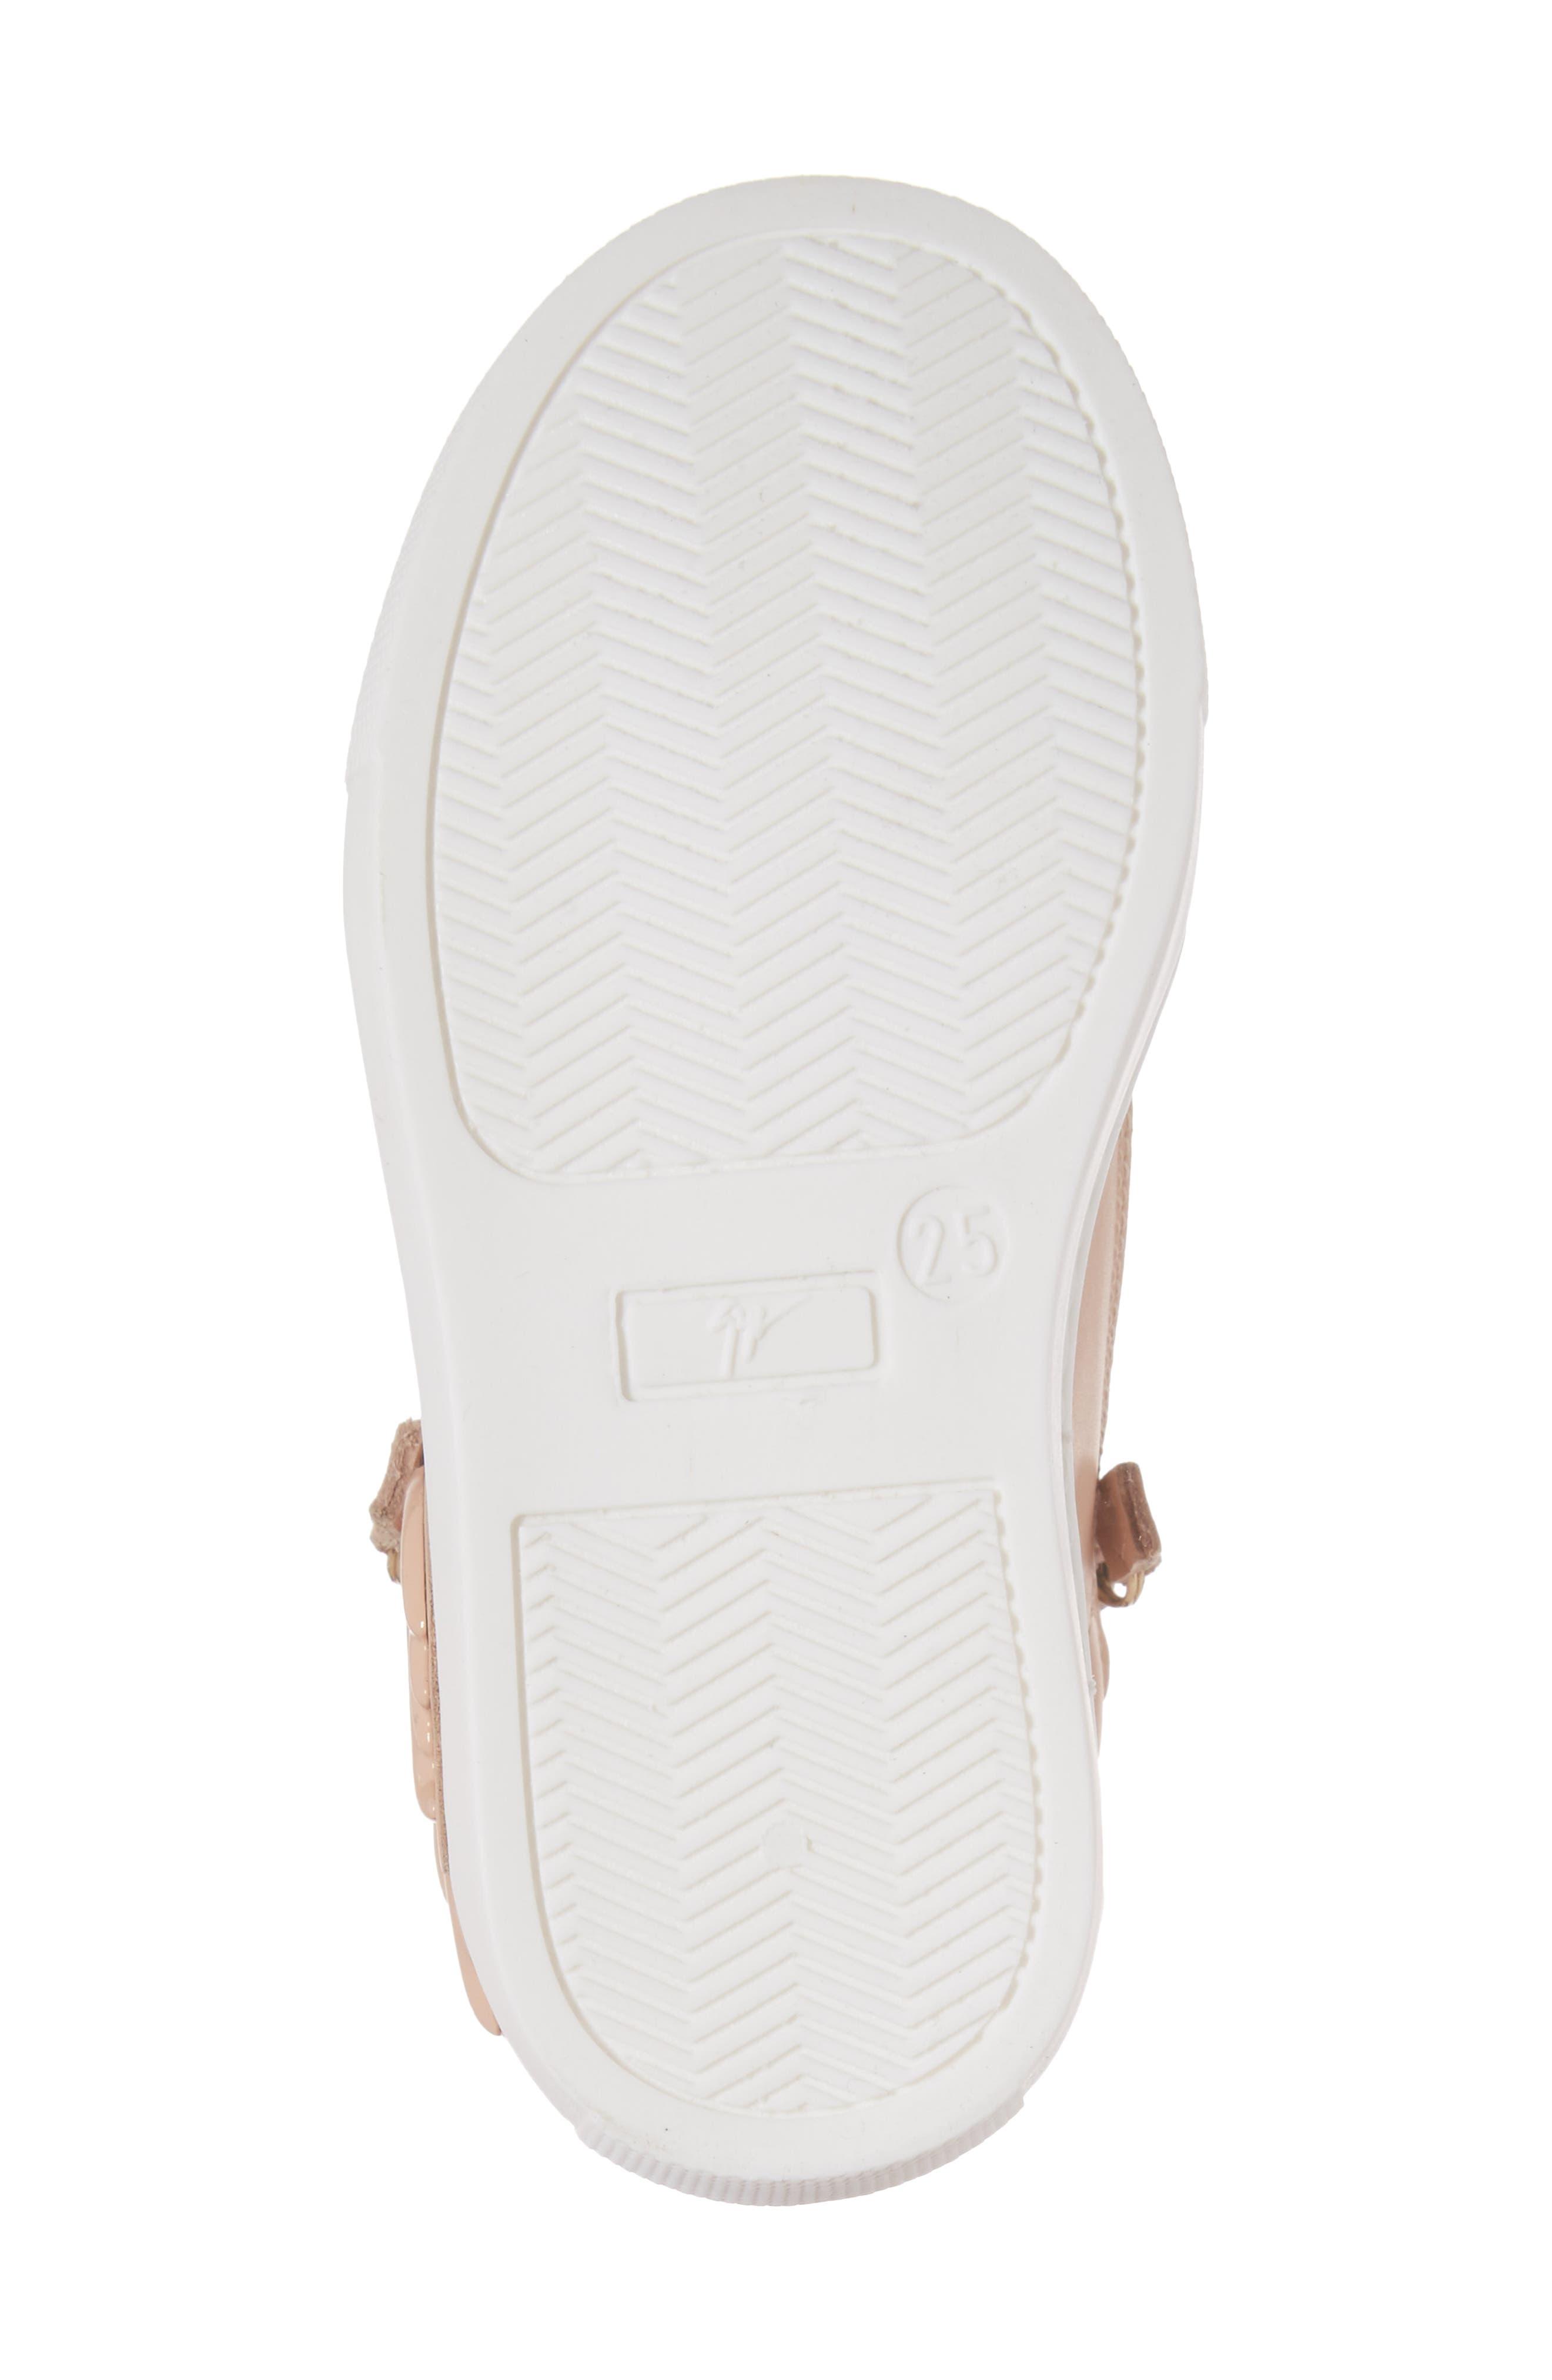 Foglia Embellished Zip Sneaker,                             Alternate thumbnail 6, color,                             Shell Leather